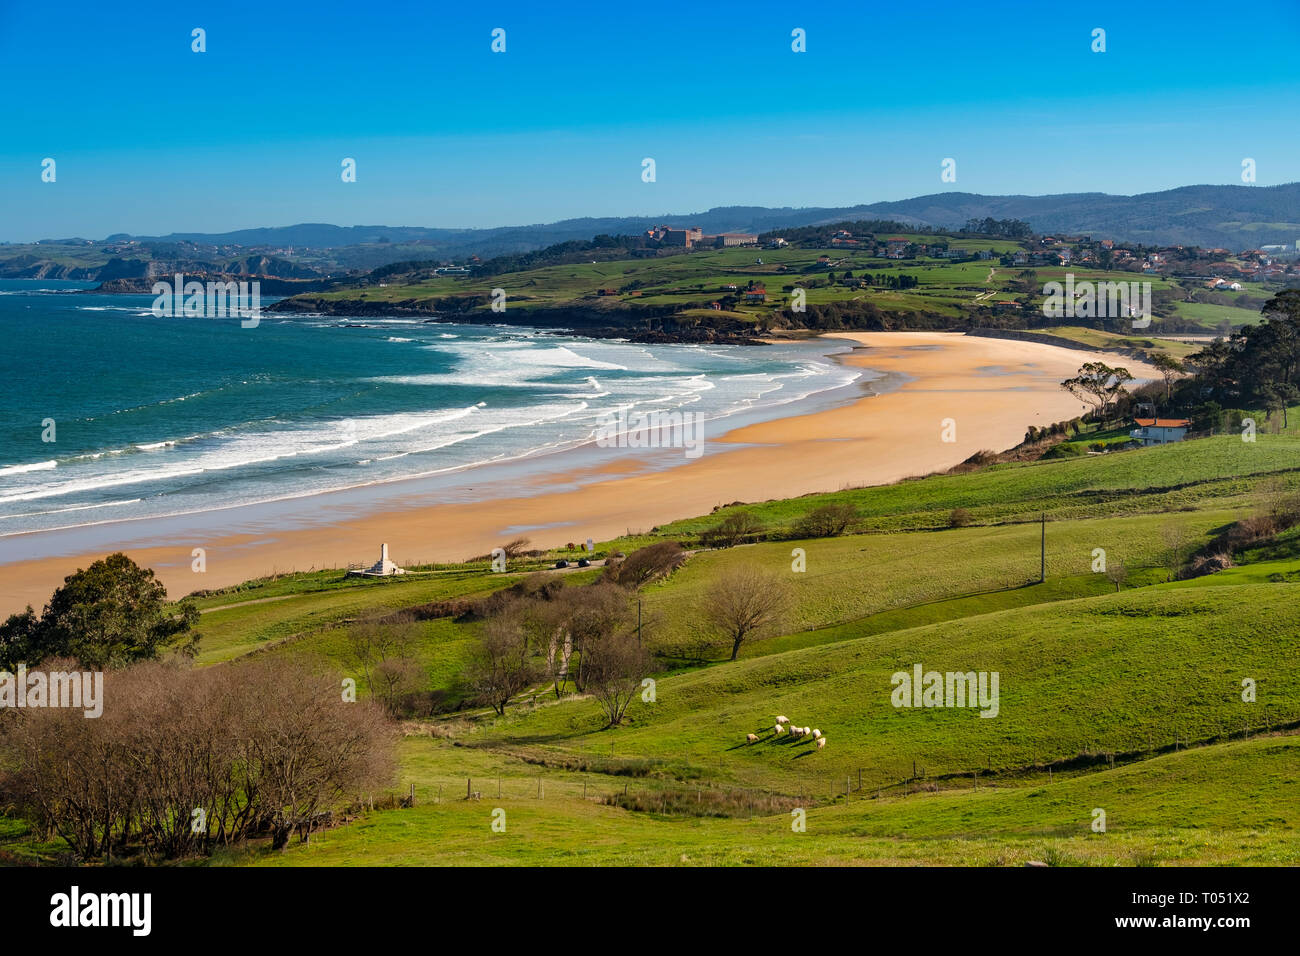 Meadow of fresh green grass. Oyambre beach, Comillas. Cantabrian Sea. Cantabria Spain. Europe Stock Photo